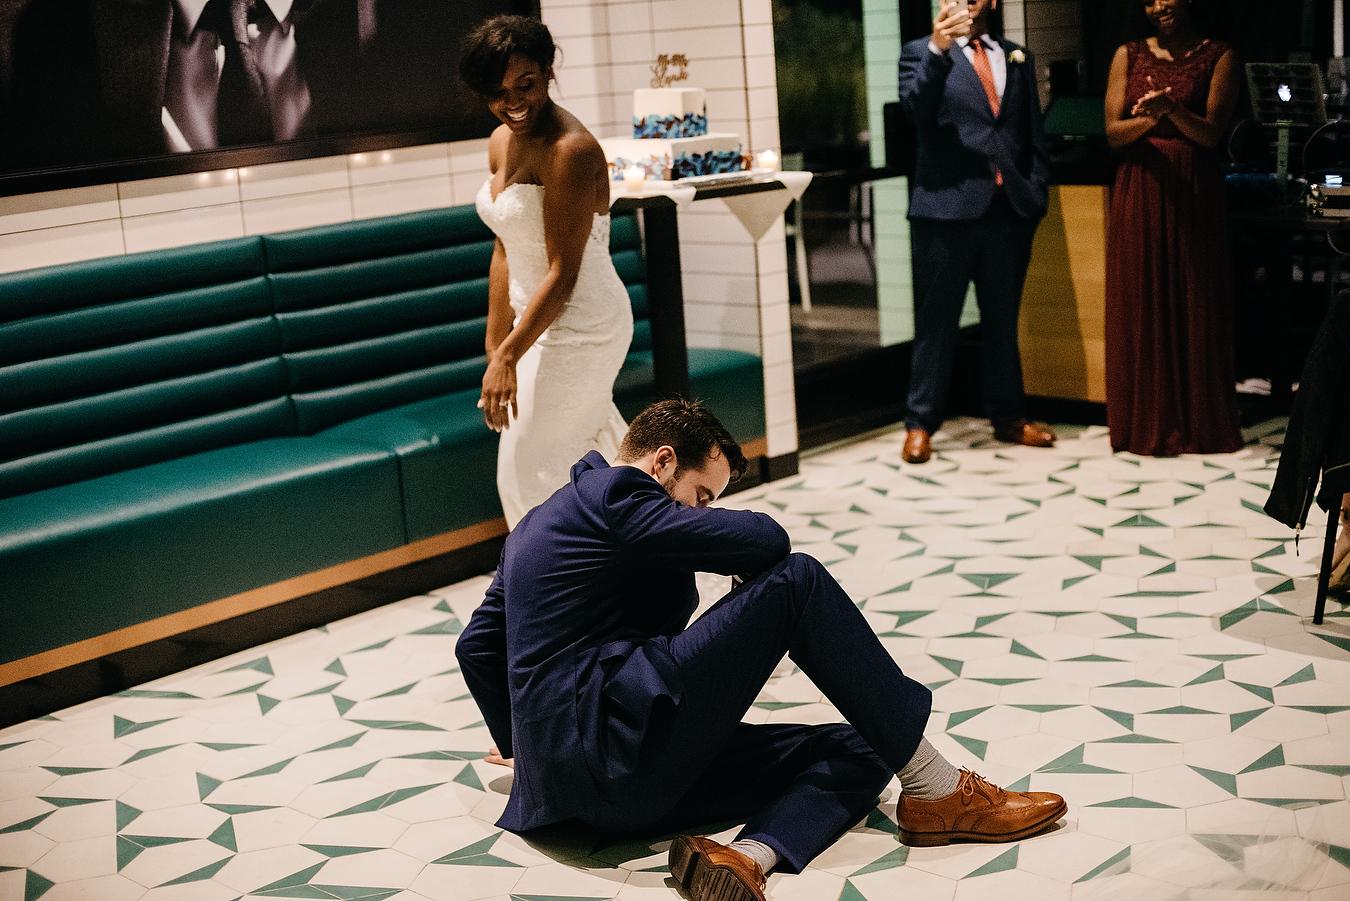 mit_chapel_cambridge_wedding_photos_72.JPG